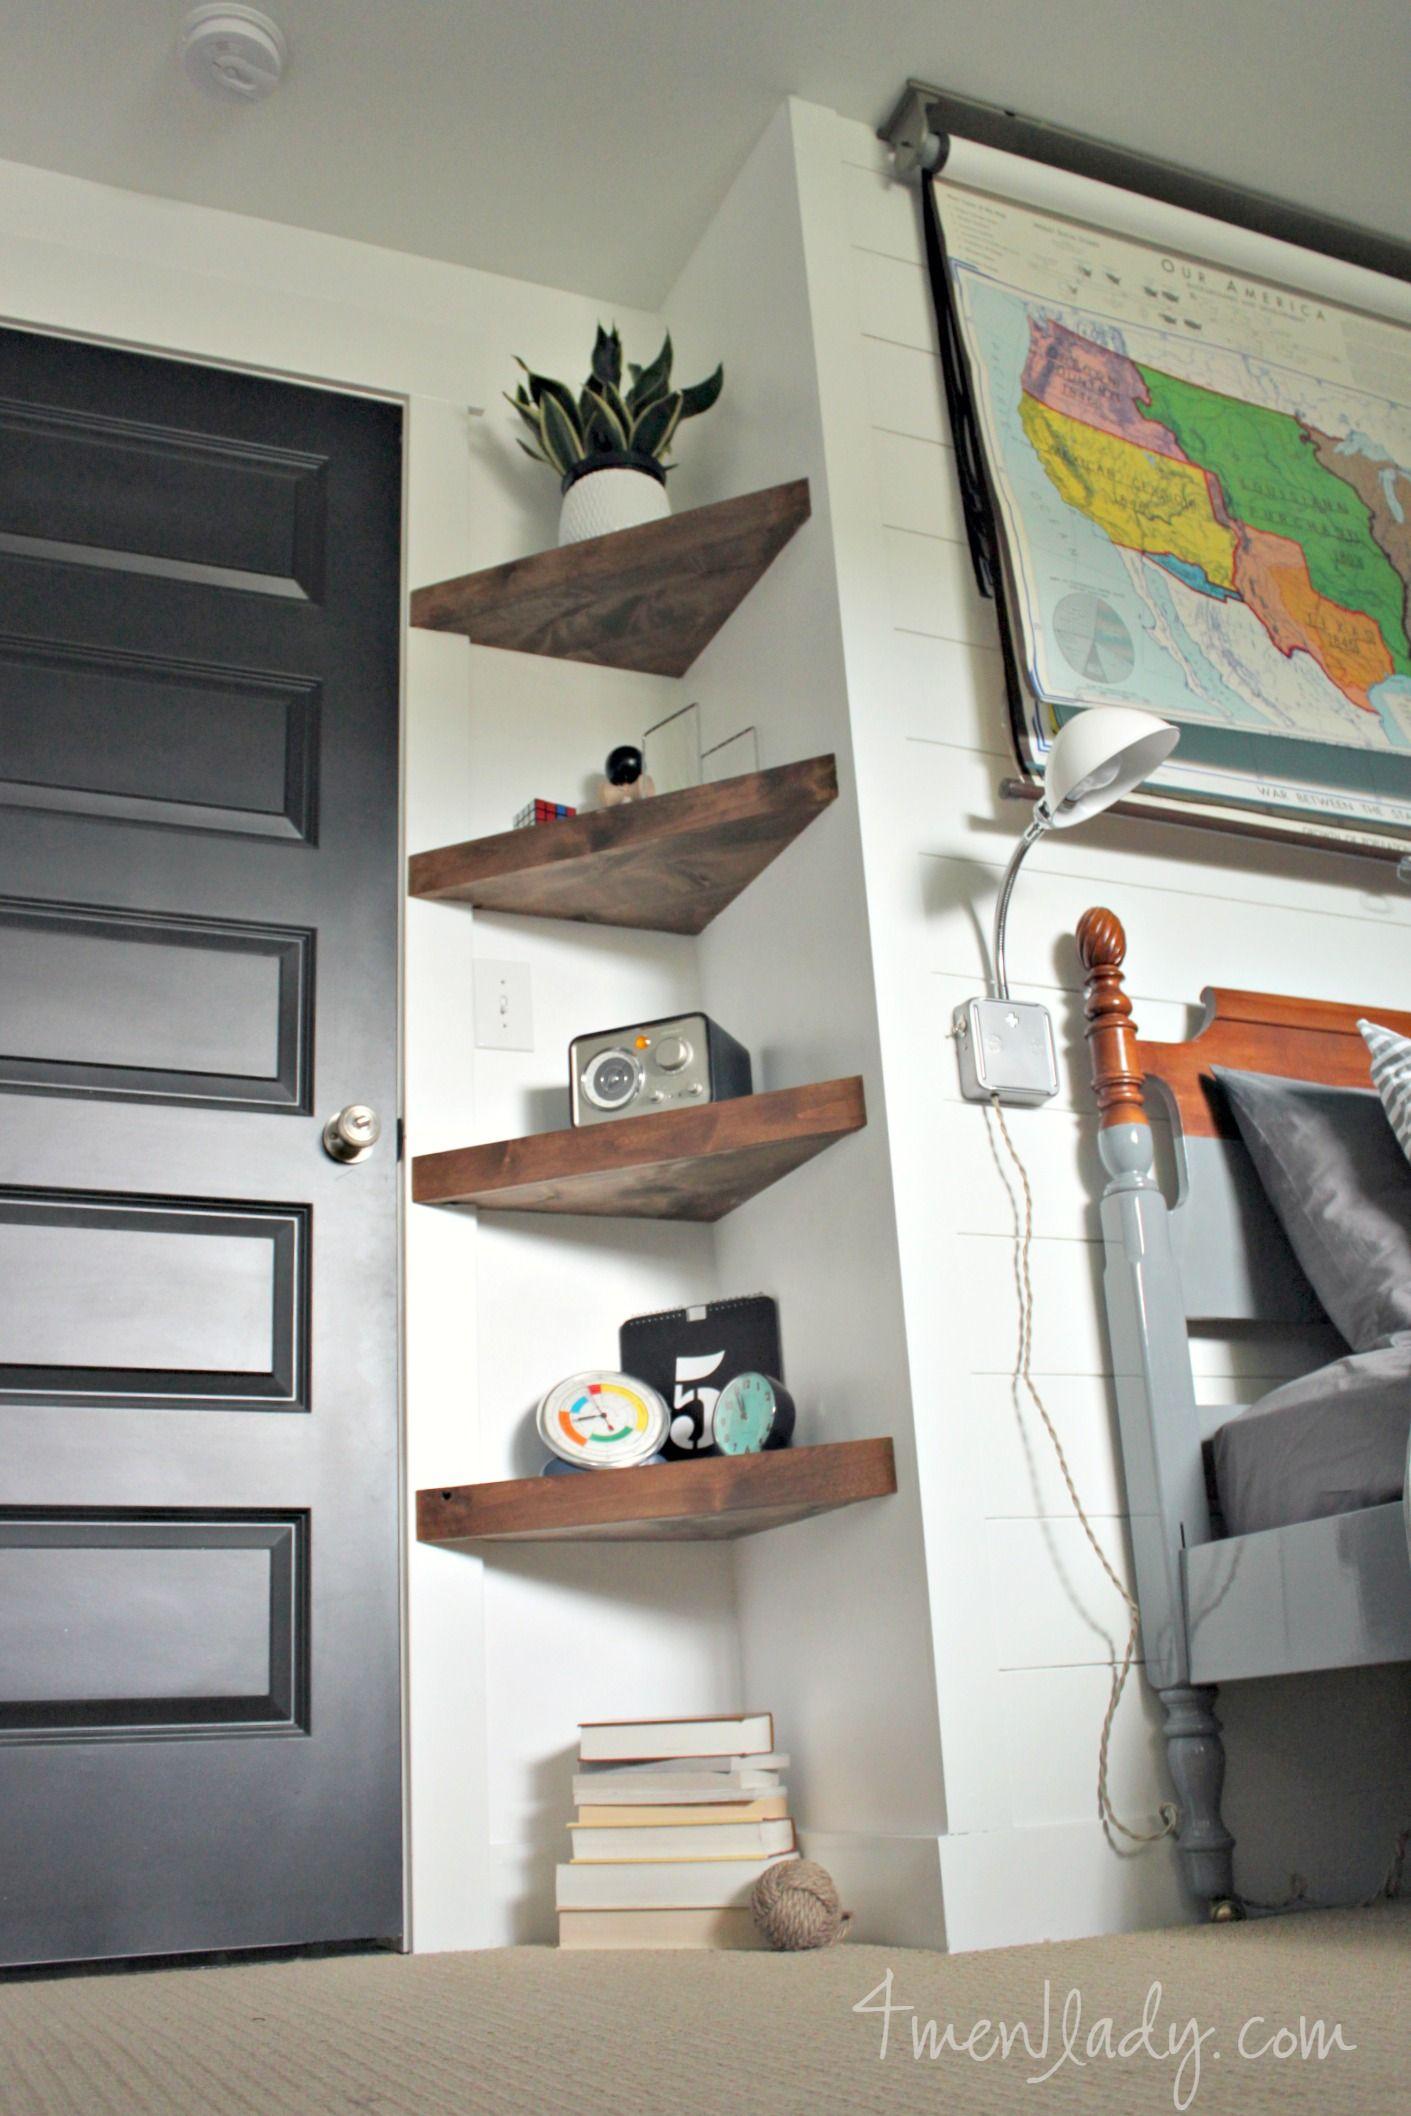 corner shelf for living room wall racks designs rooms boy s bedroom ideas before and after plank floating shelves diy reveal